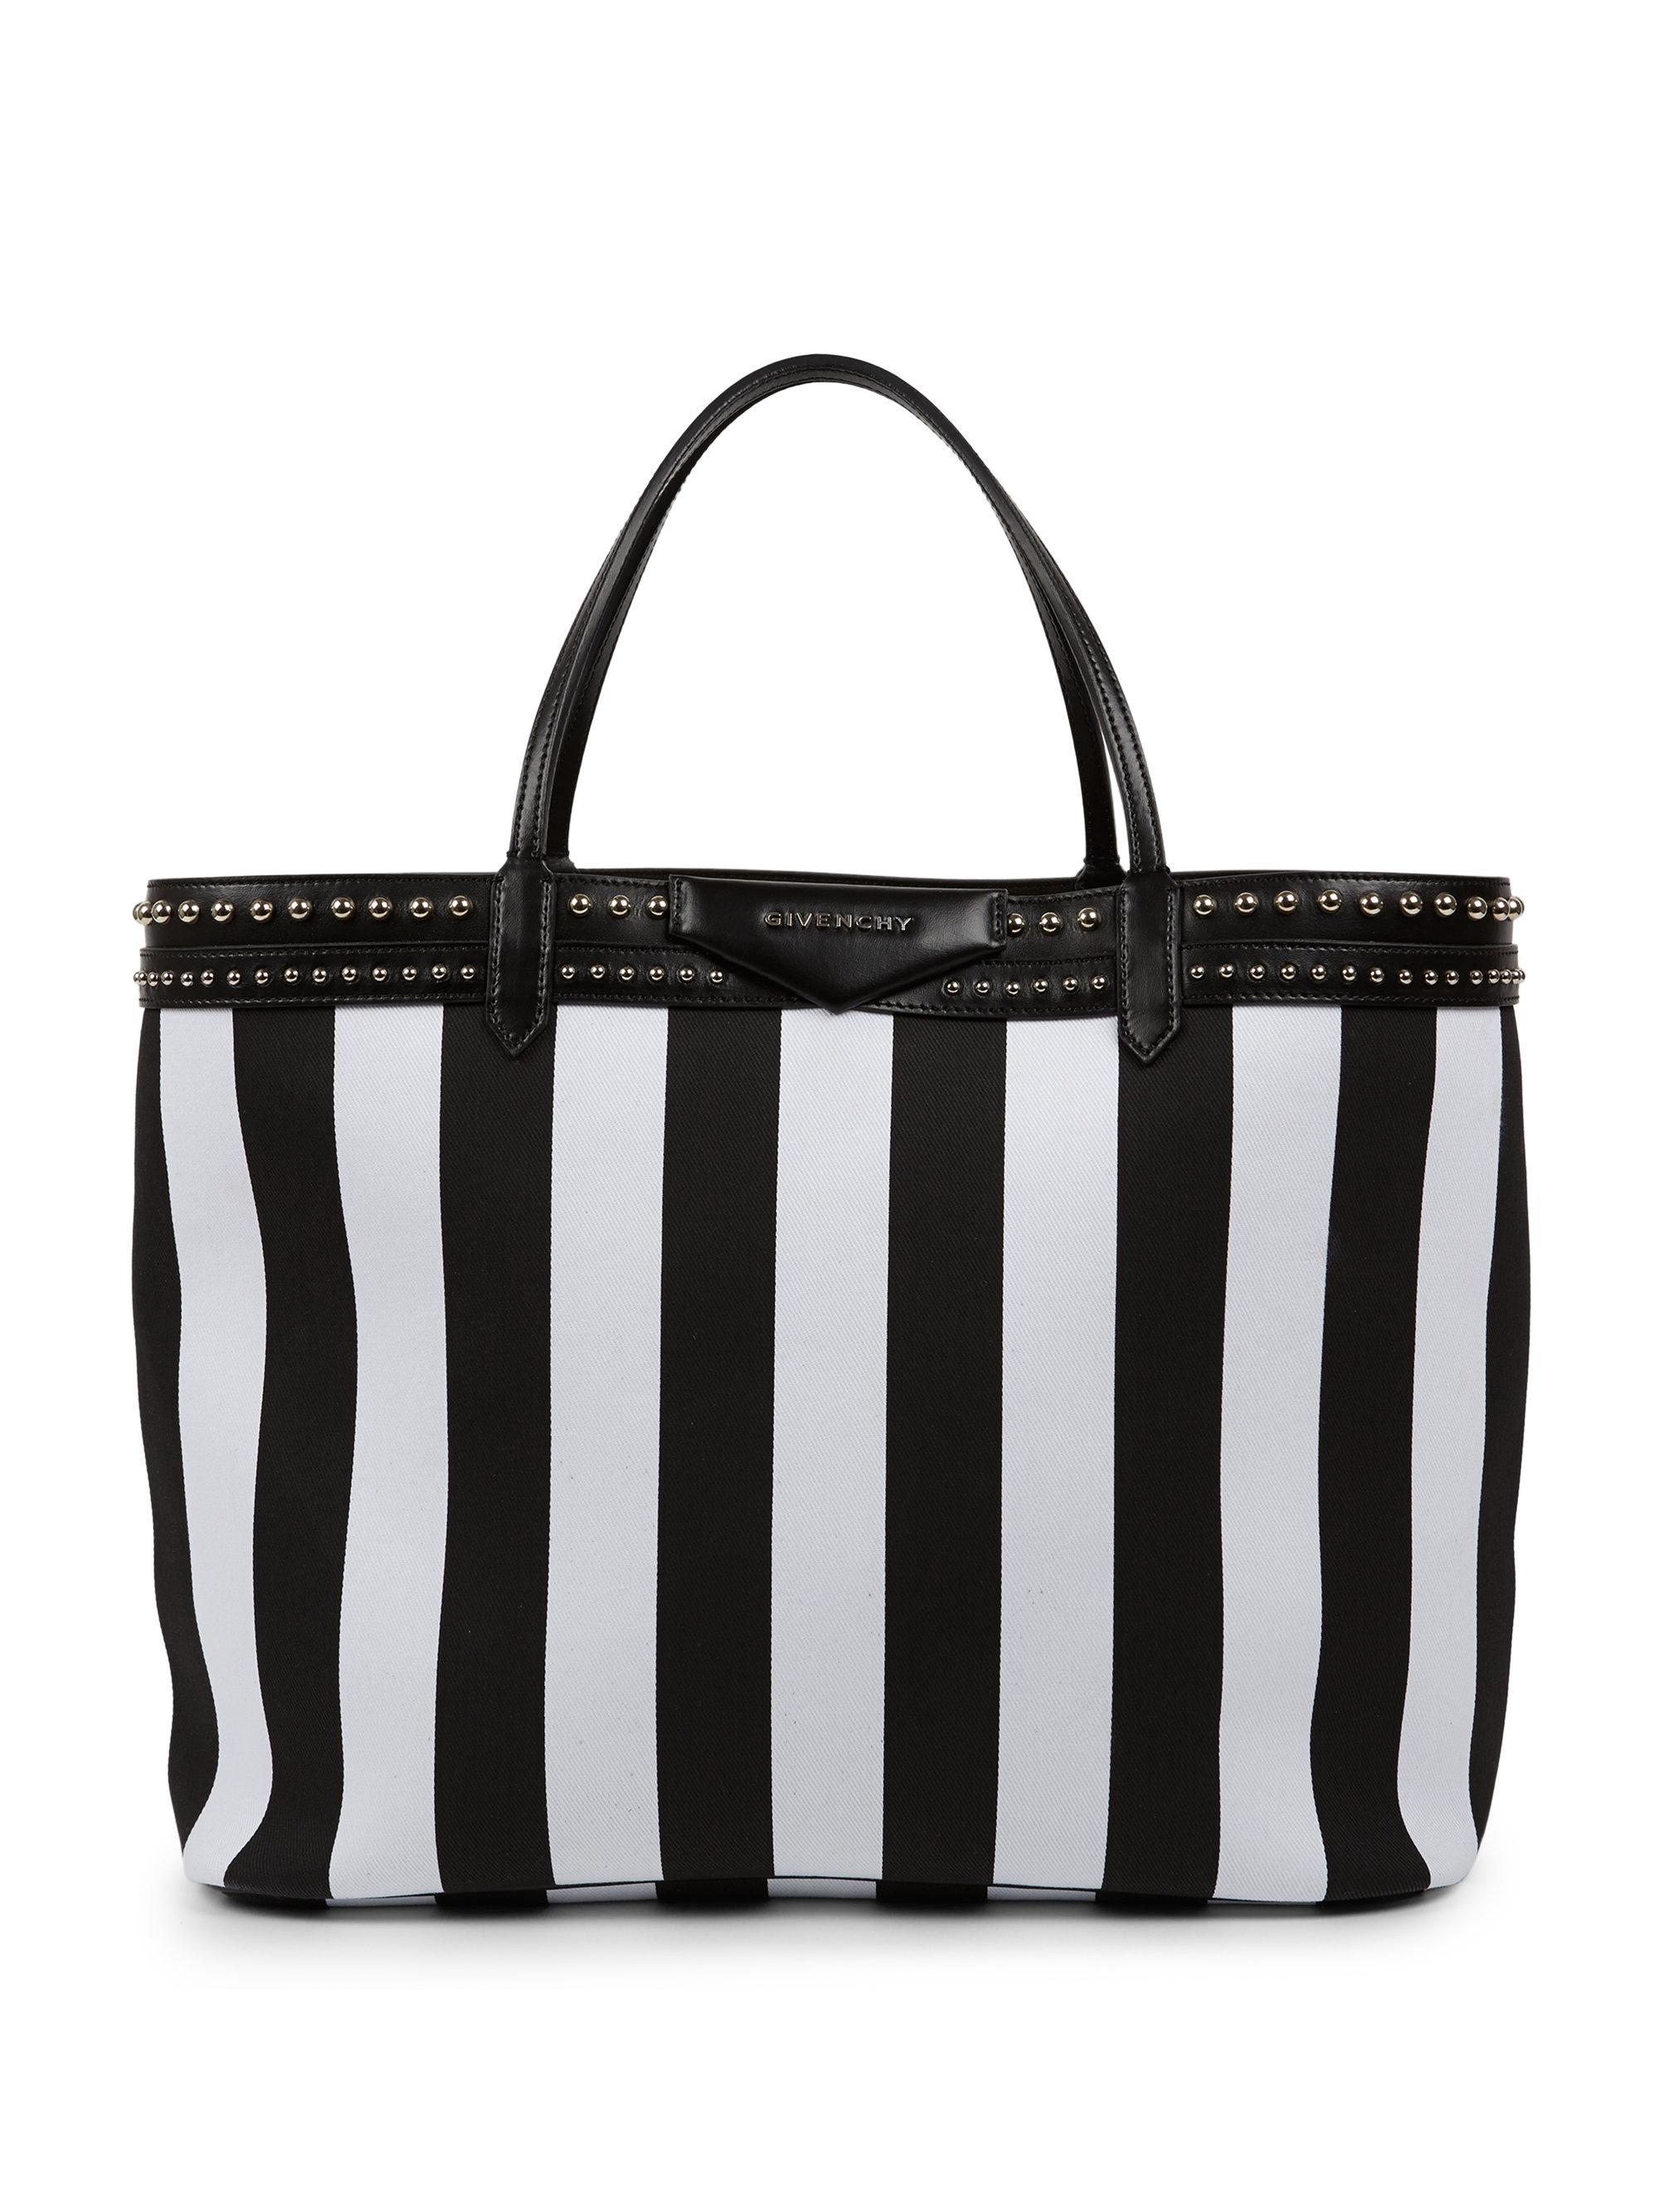 Lyst - Givenchy Antigona Coated Canvas Shopper Tote in Black 1e7e063b0e